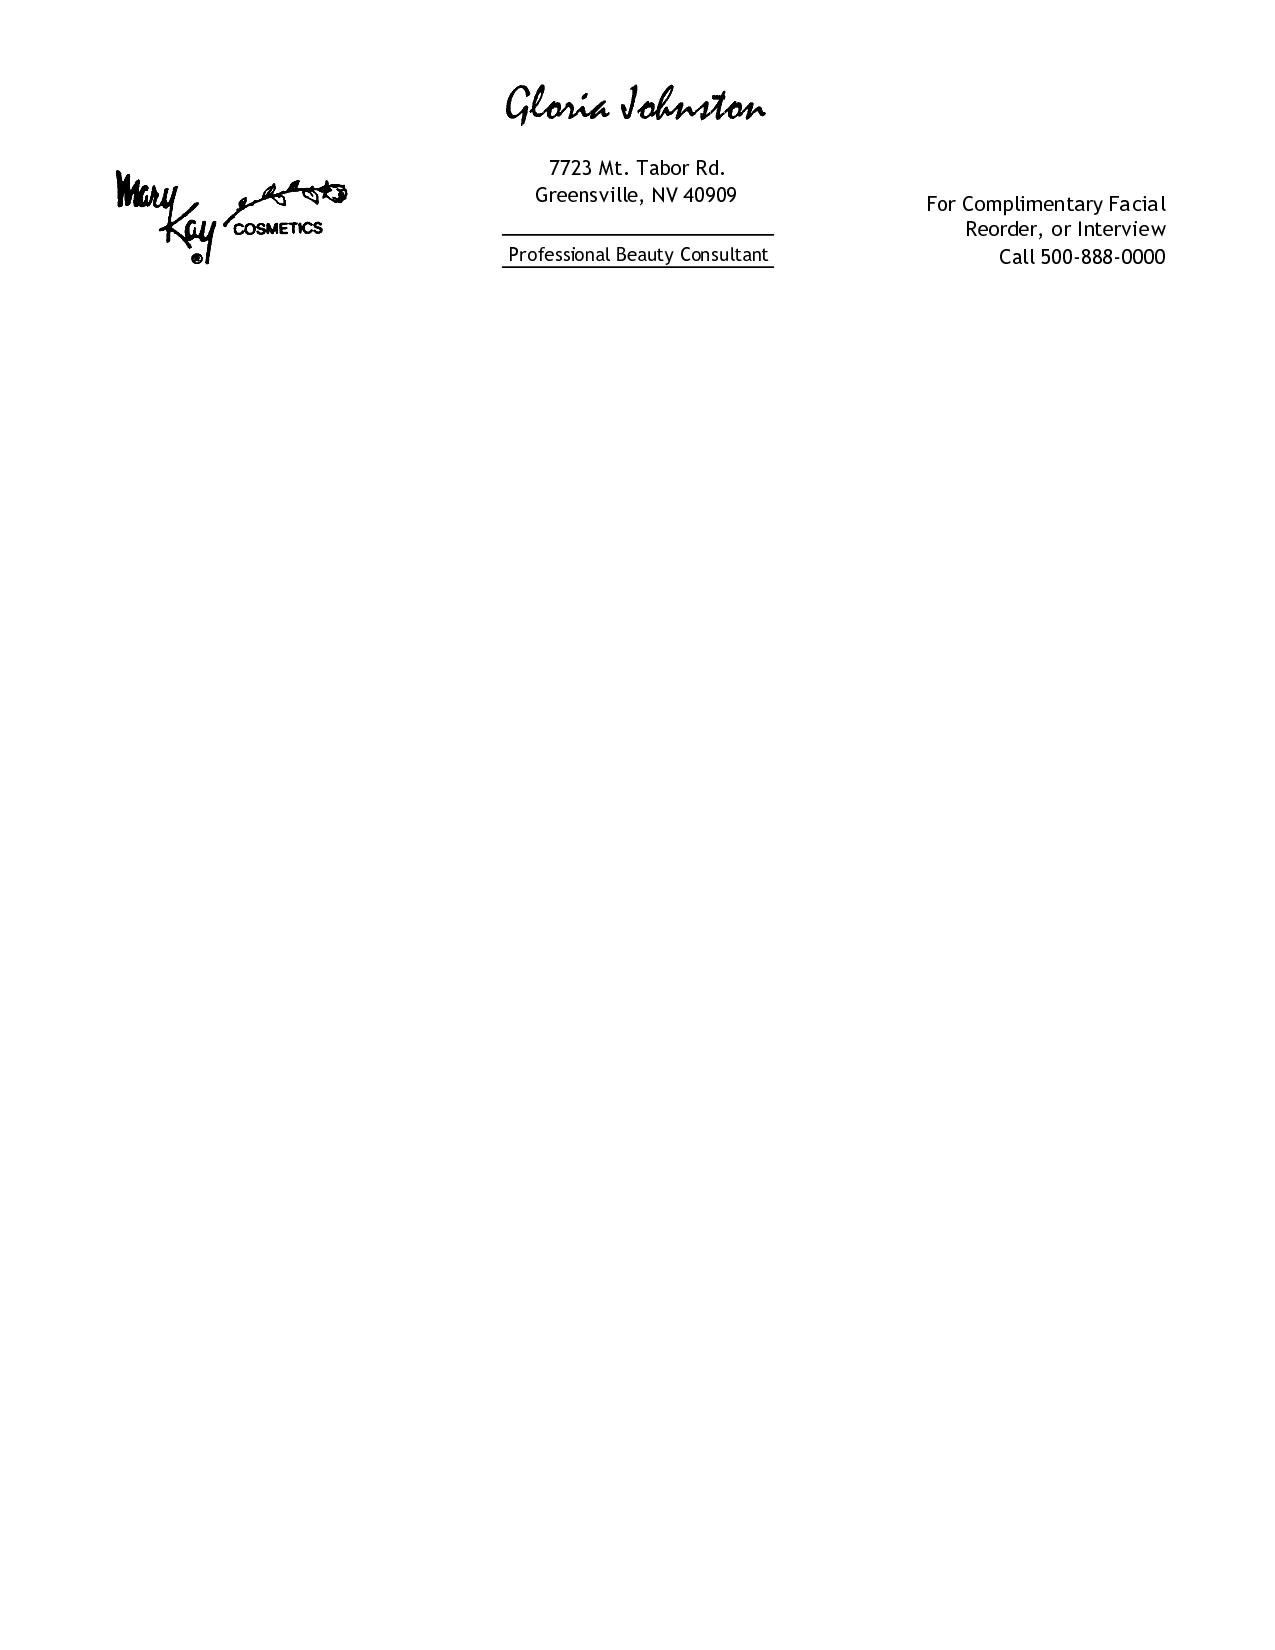 Free Personal Letterhead Templates